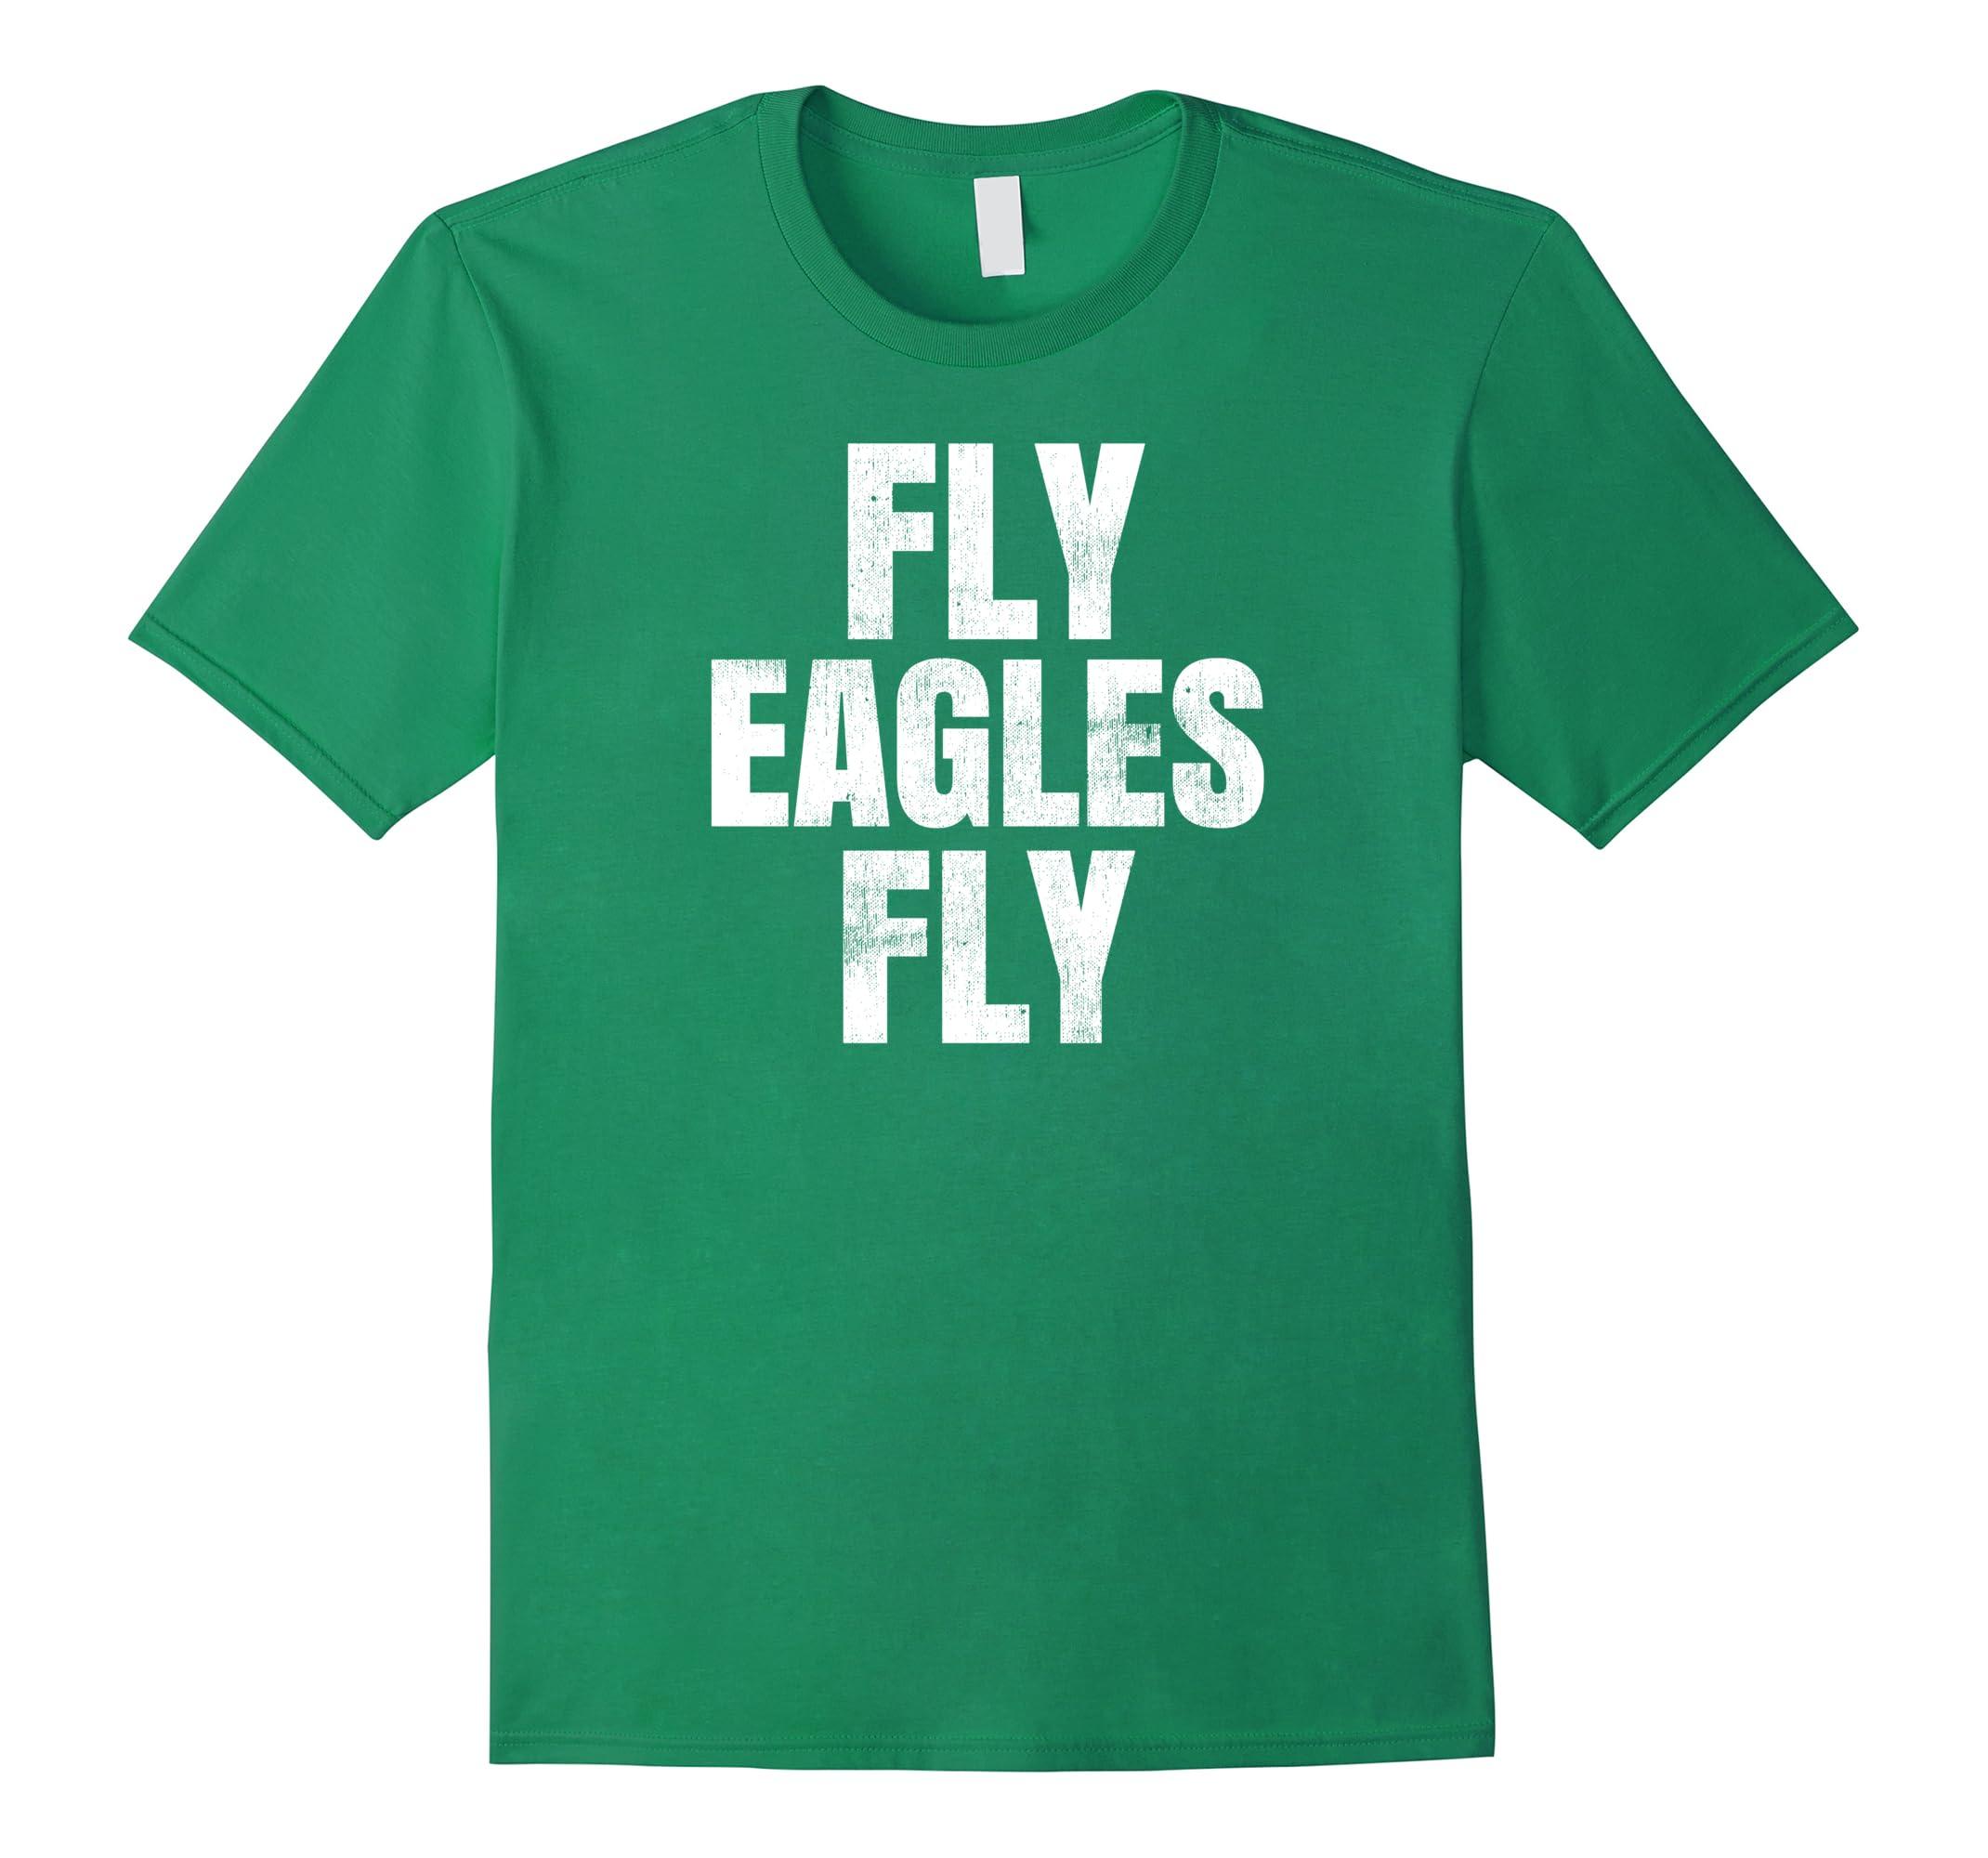 Fly eagles fly t shirt flying eagles tshirt women men for Eagles t shirt womens